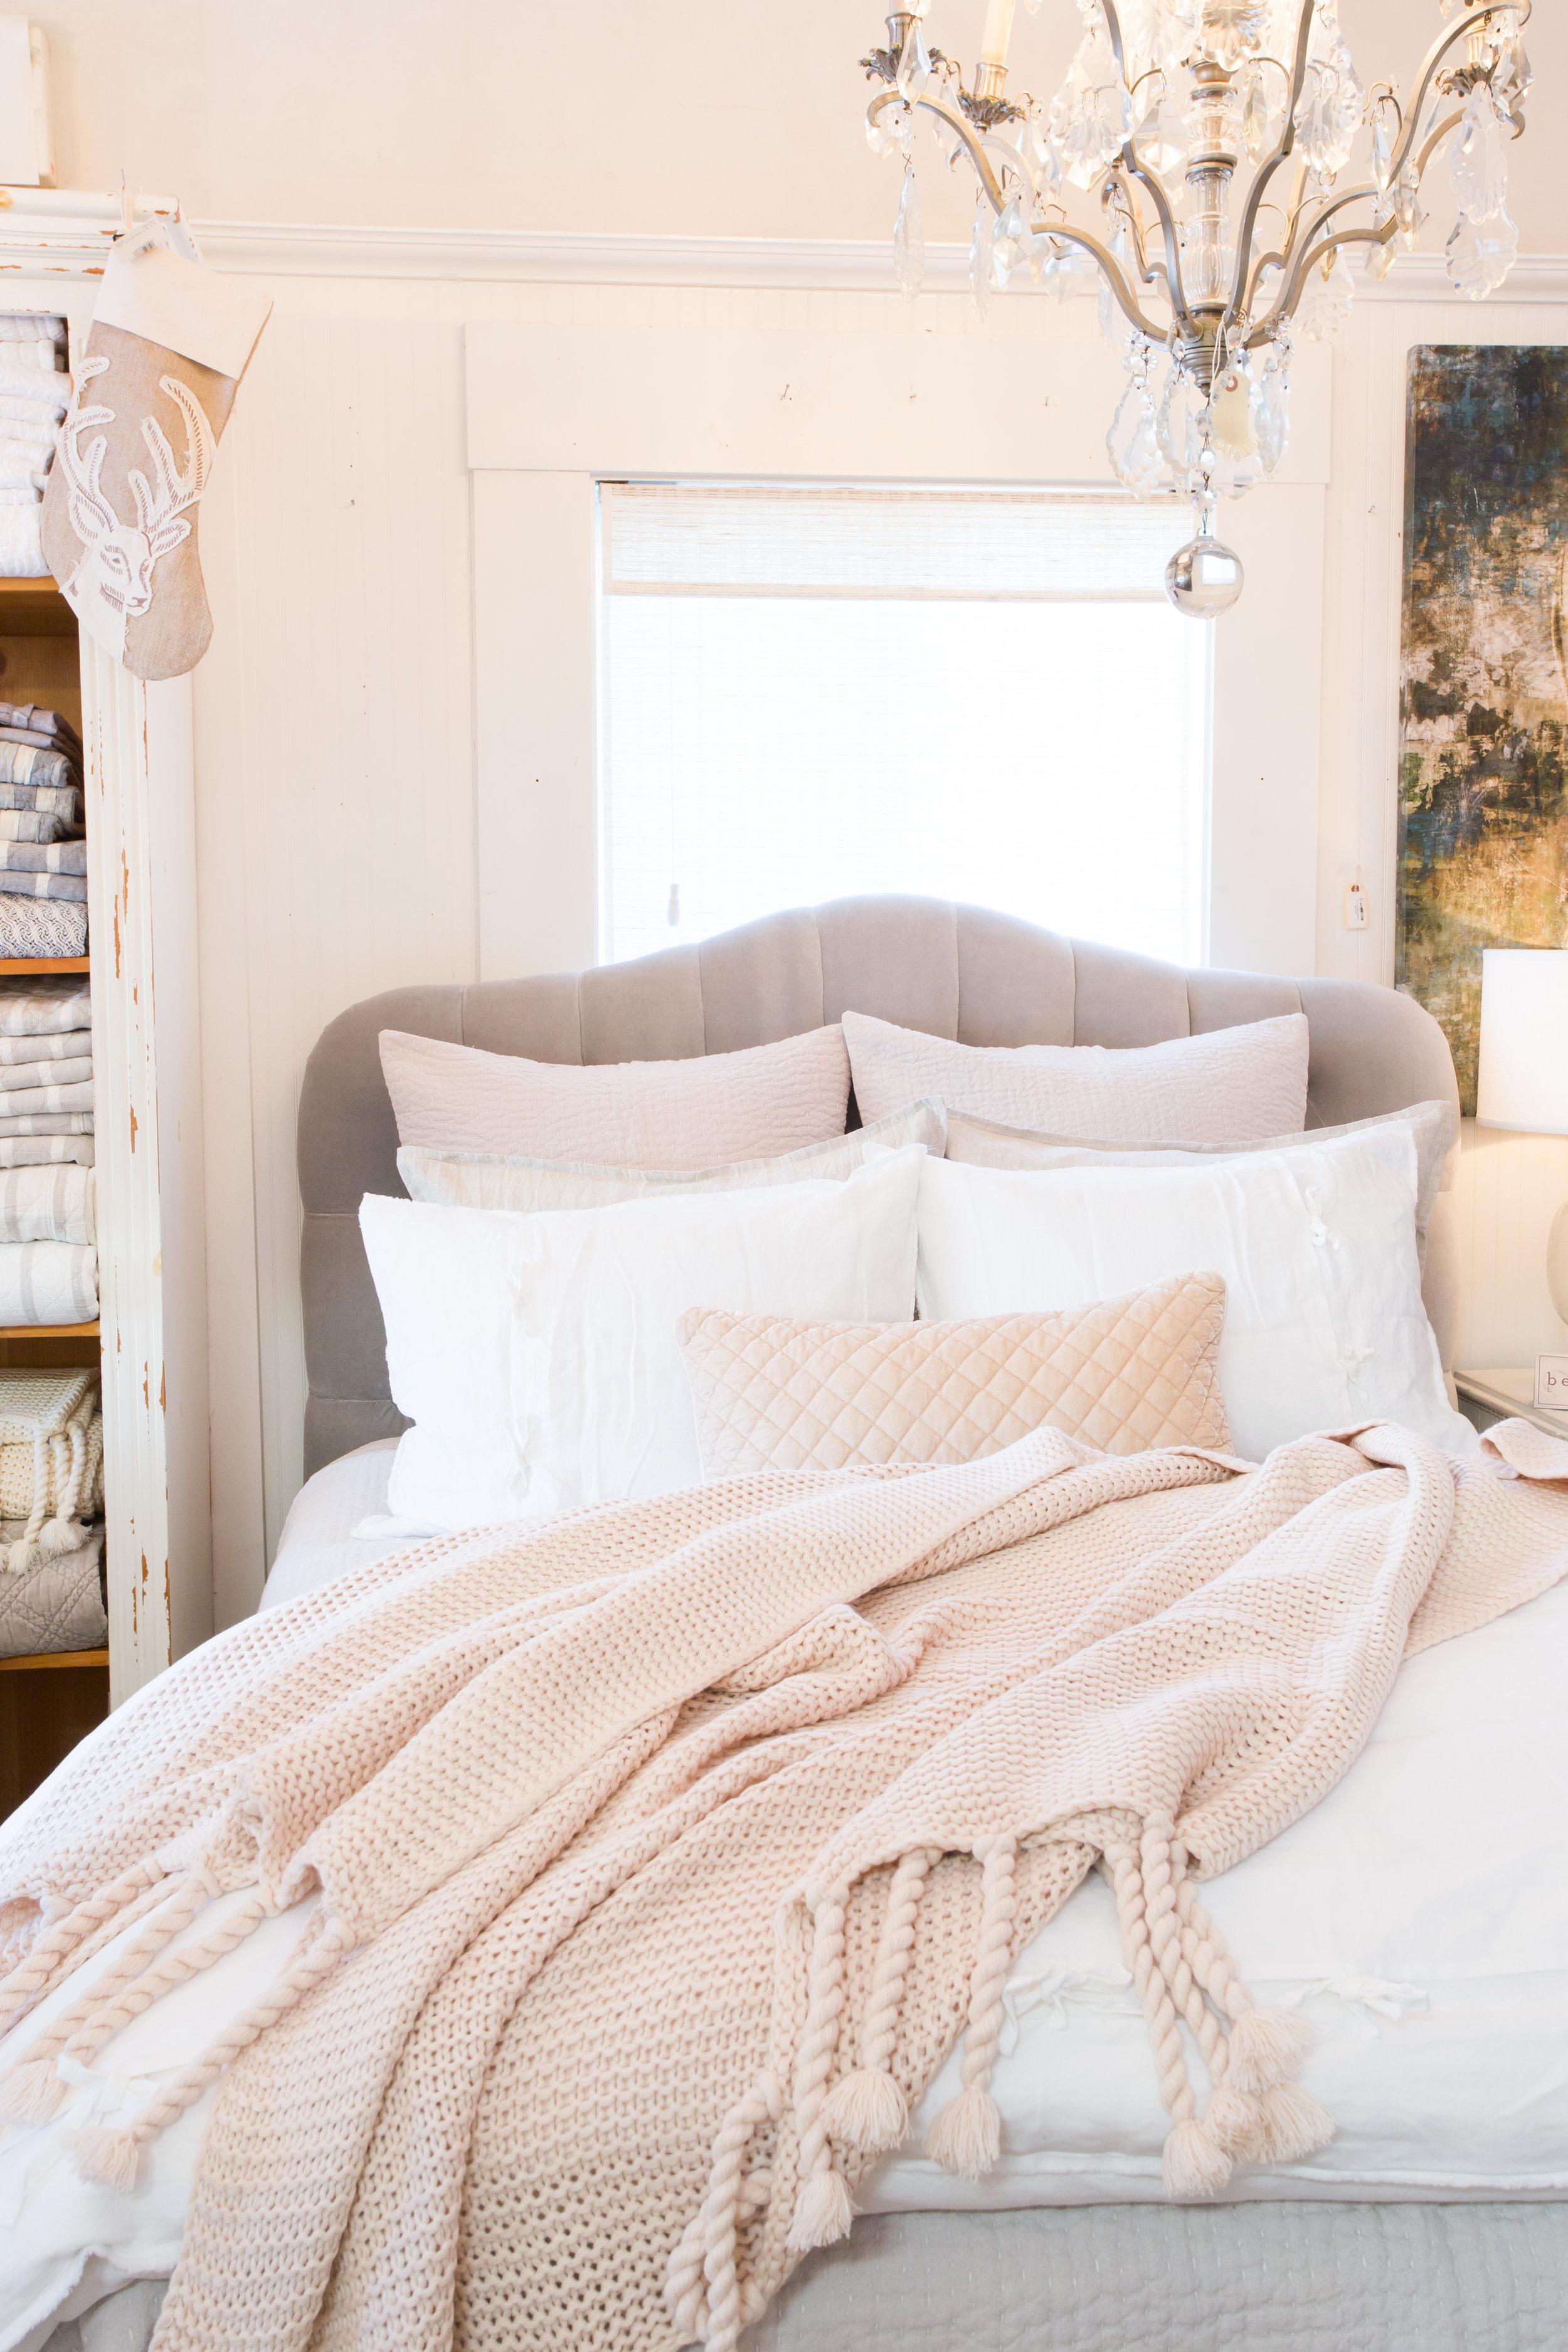 Cream bedding, blush coverlet